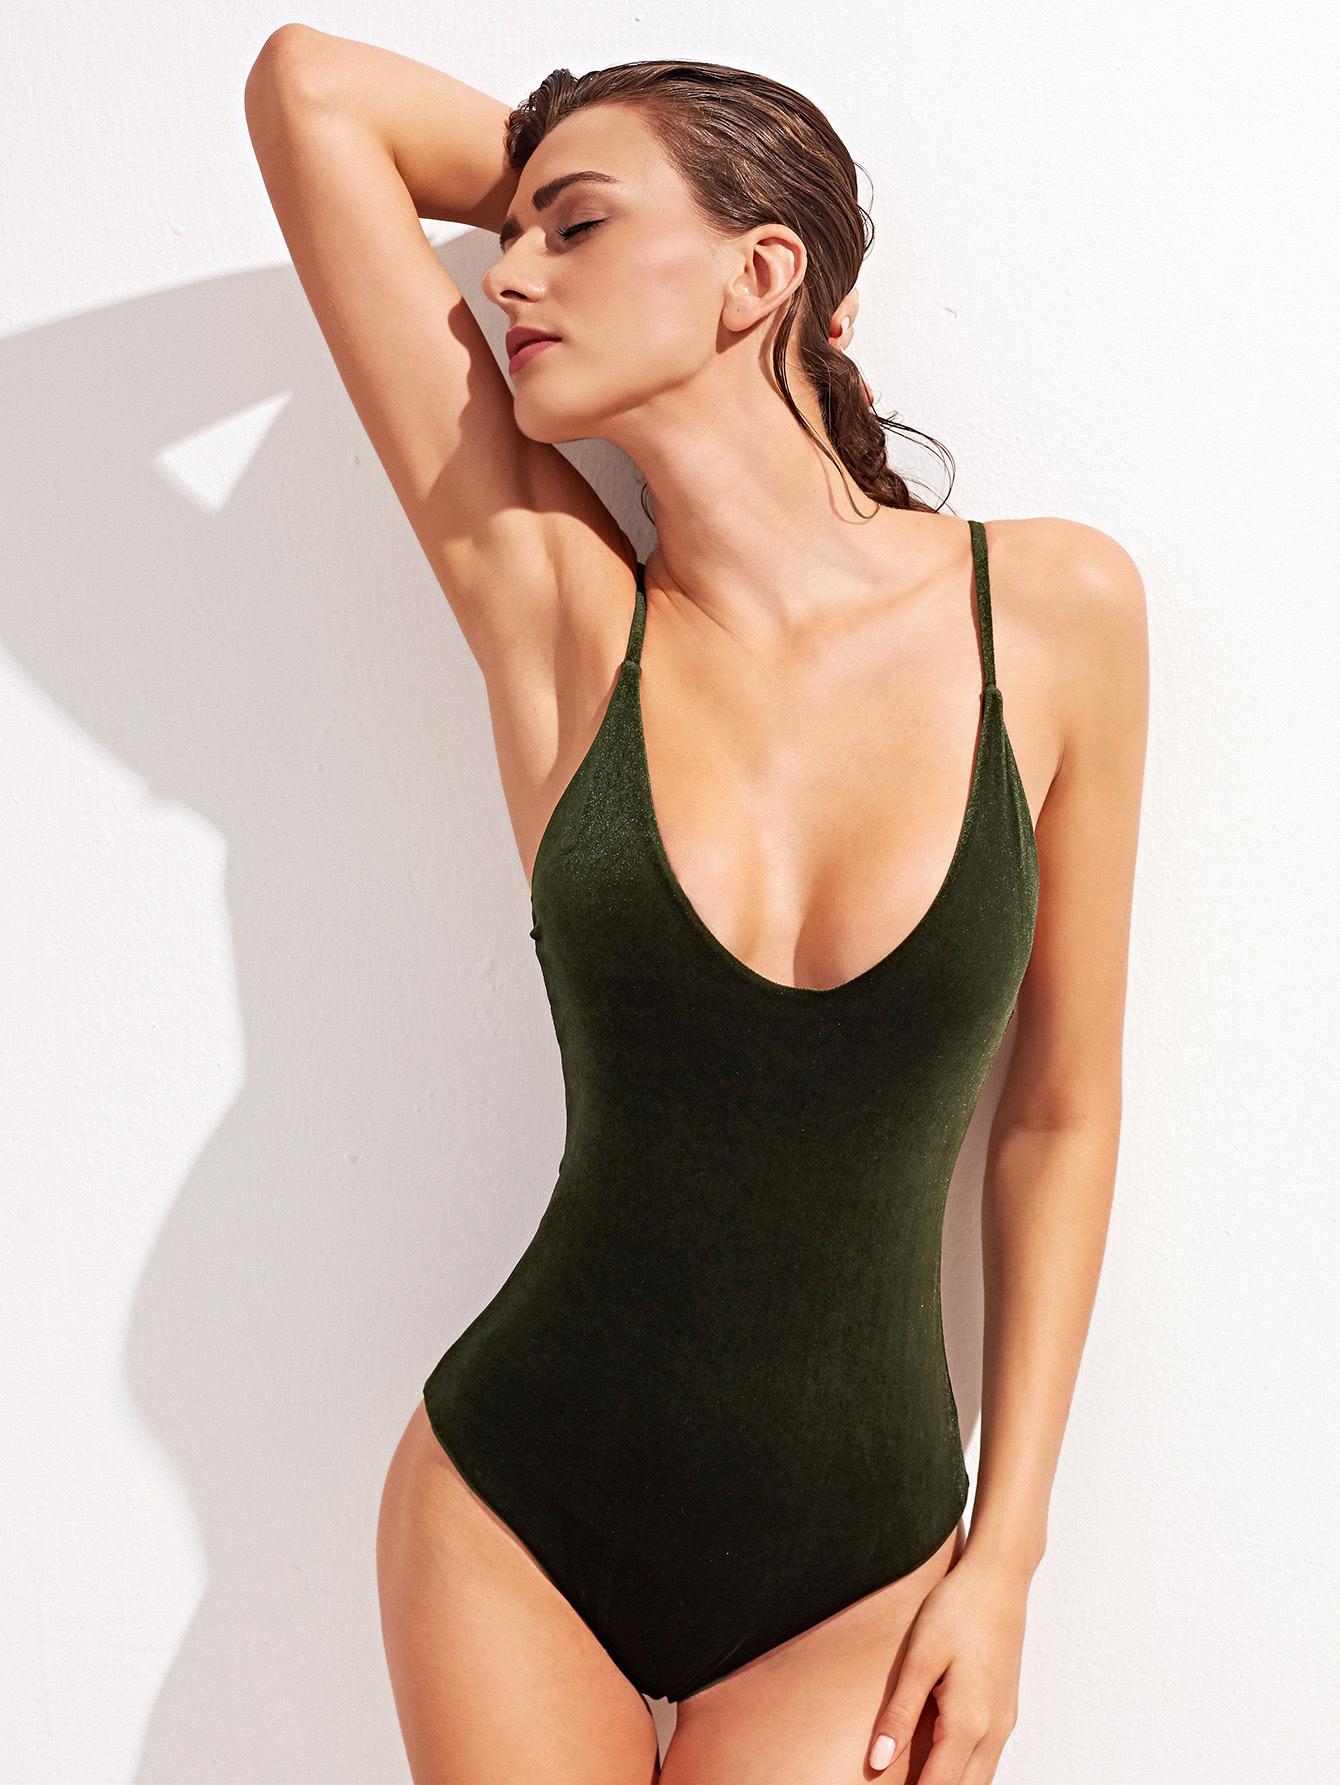 a18765435b KOZ1.com | Shop for latest women's fashion dresses, tops, bottoms.